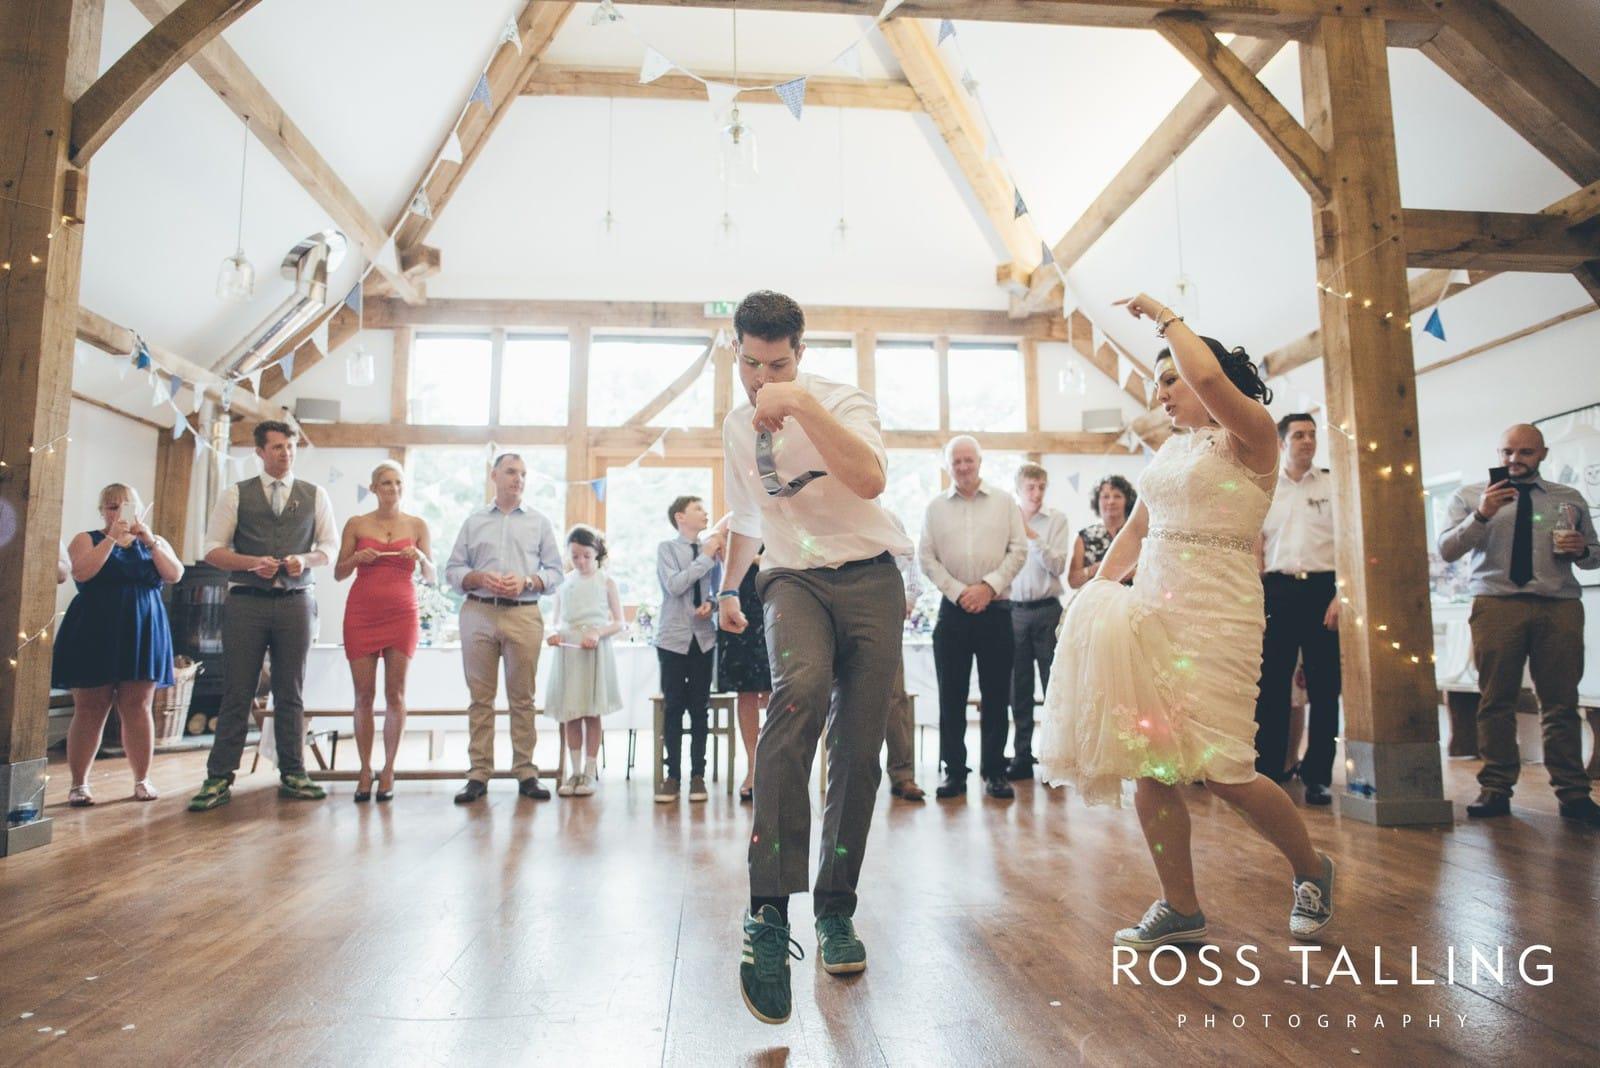 Coolest First Dance Ever Breakdancing Bride and Groom Jasmin and Ben Barnicoat_0006